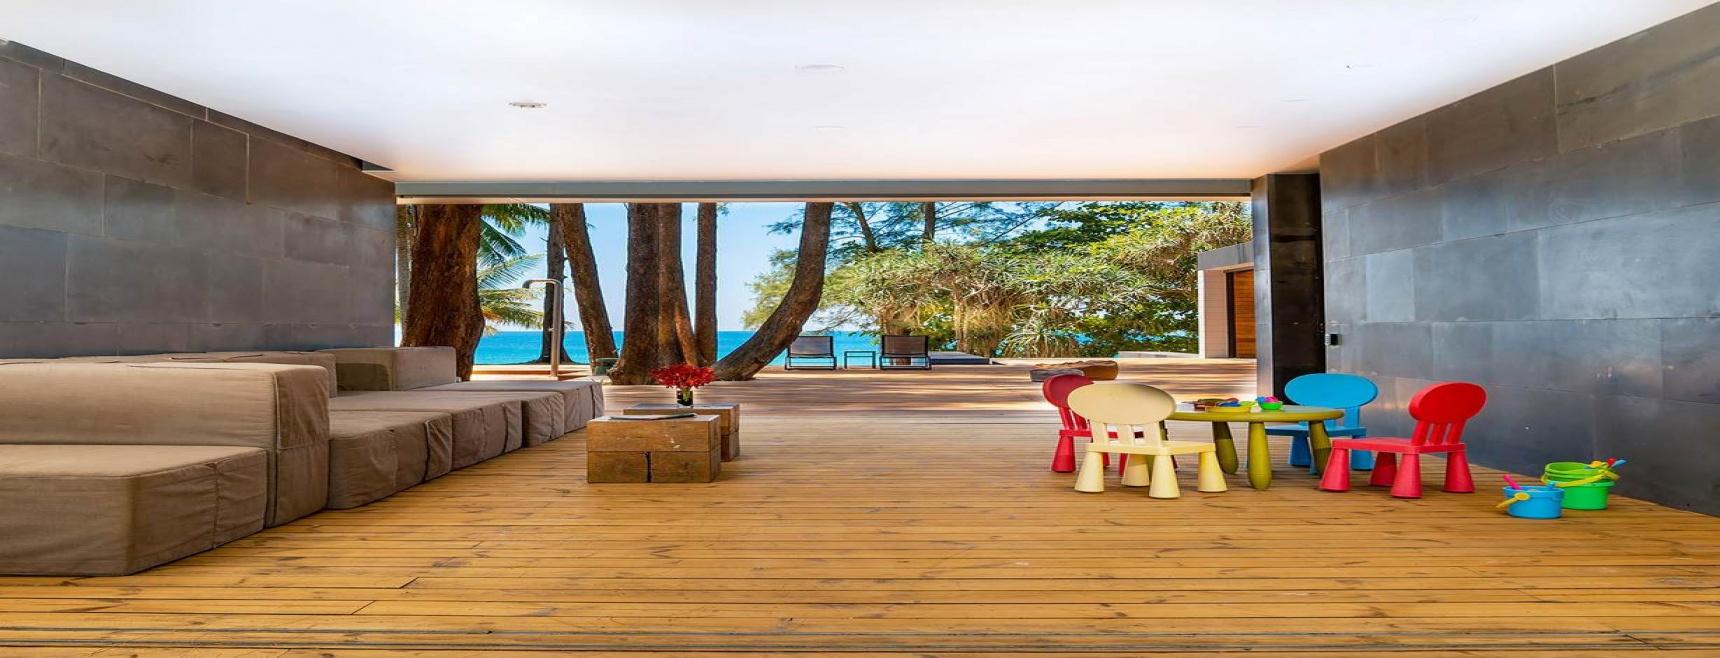 Villa Grand Noi 5 Bedroom(Thai-Real.com)